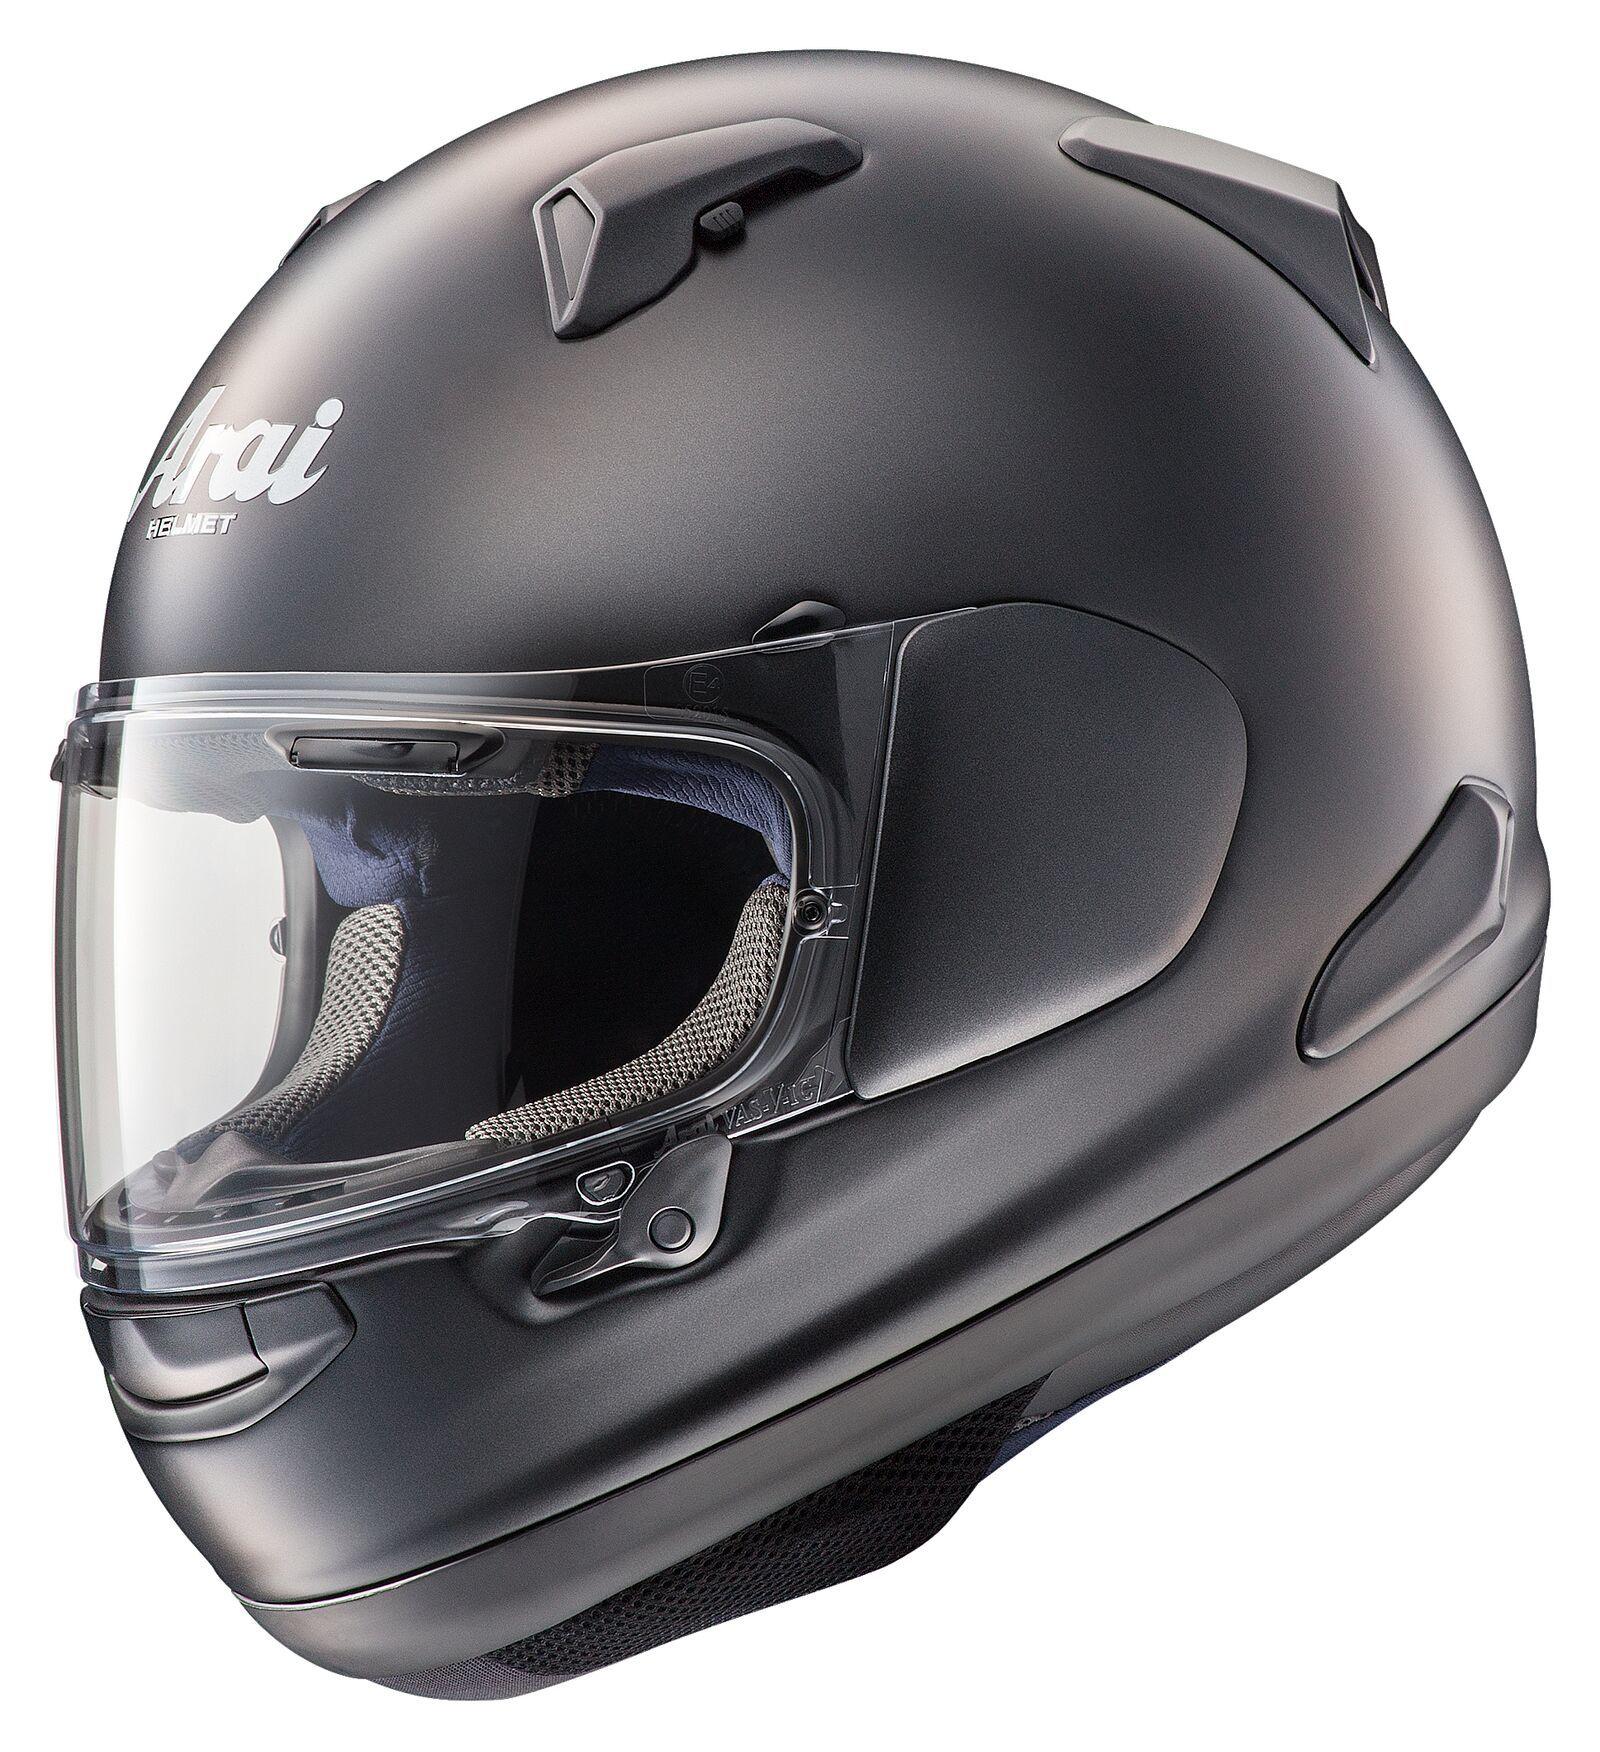 Arai Helmets | Motorcycle & Off Road Helmets From Aria - Cycle Gear